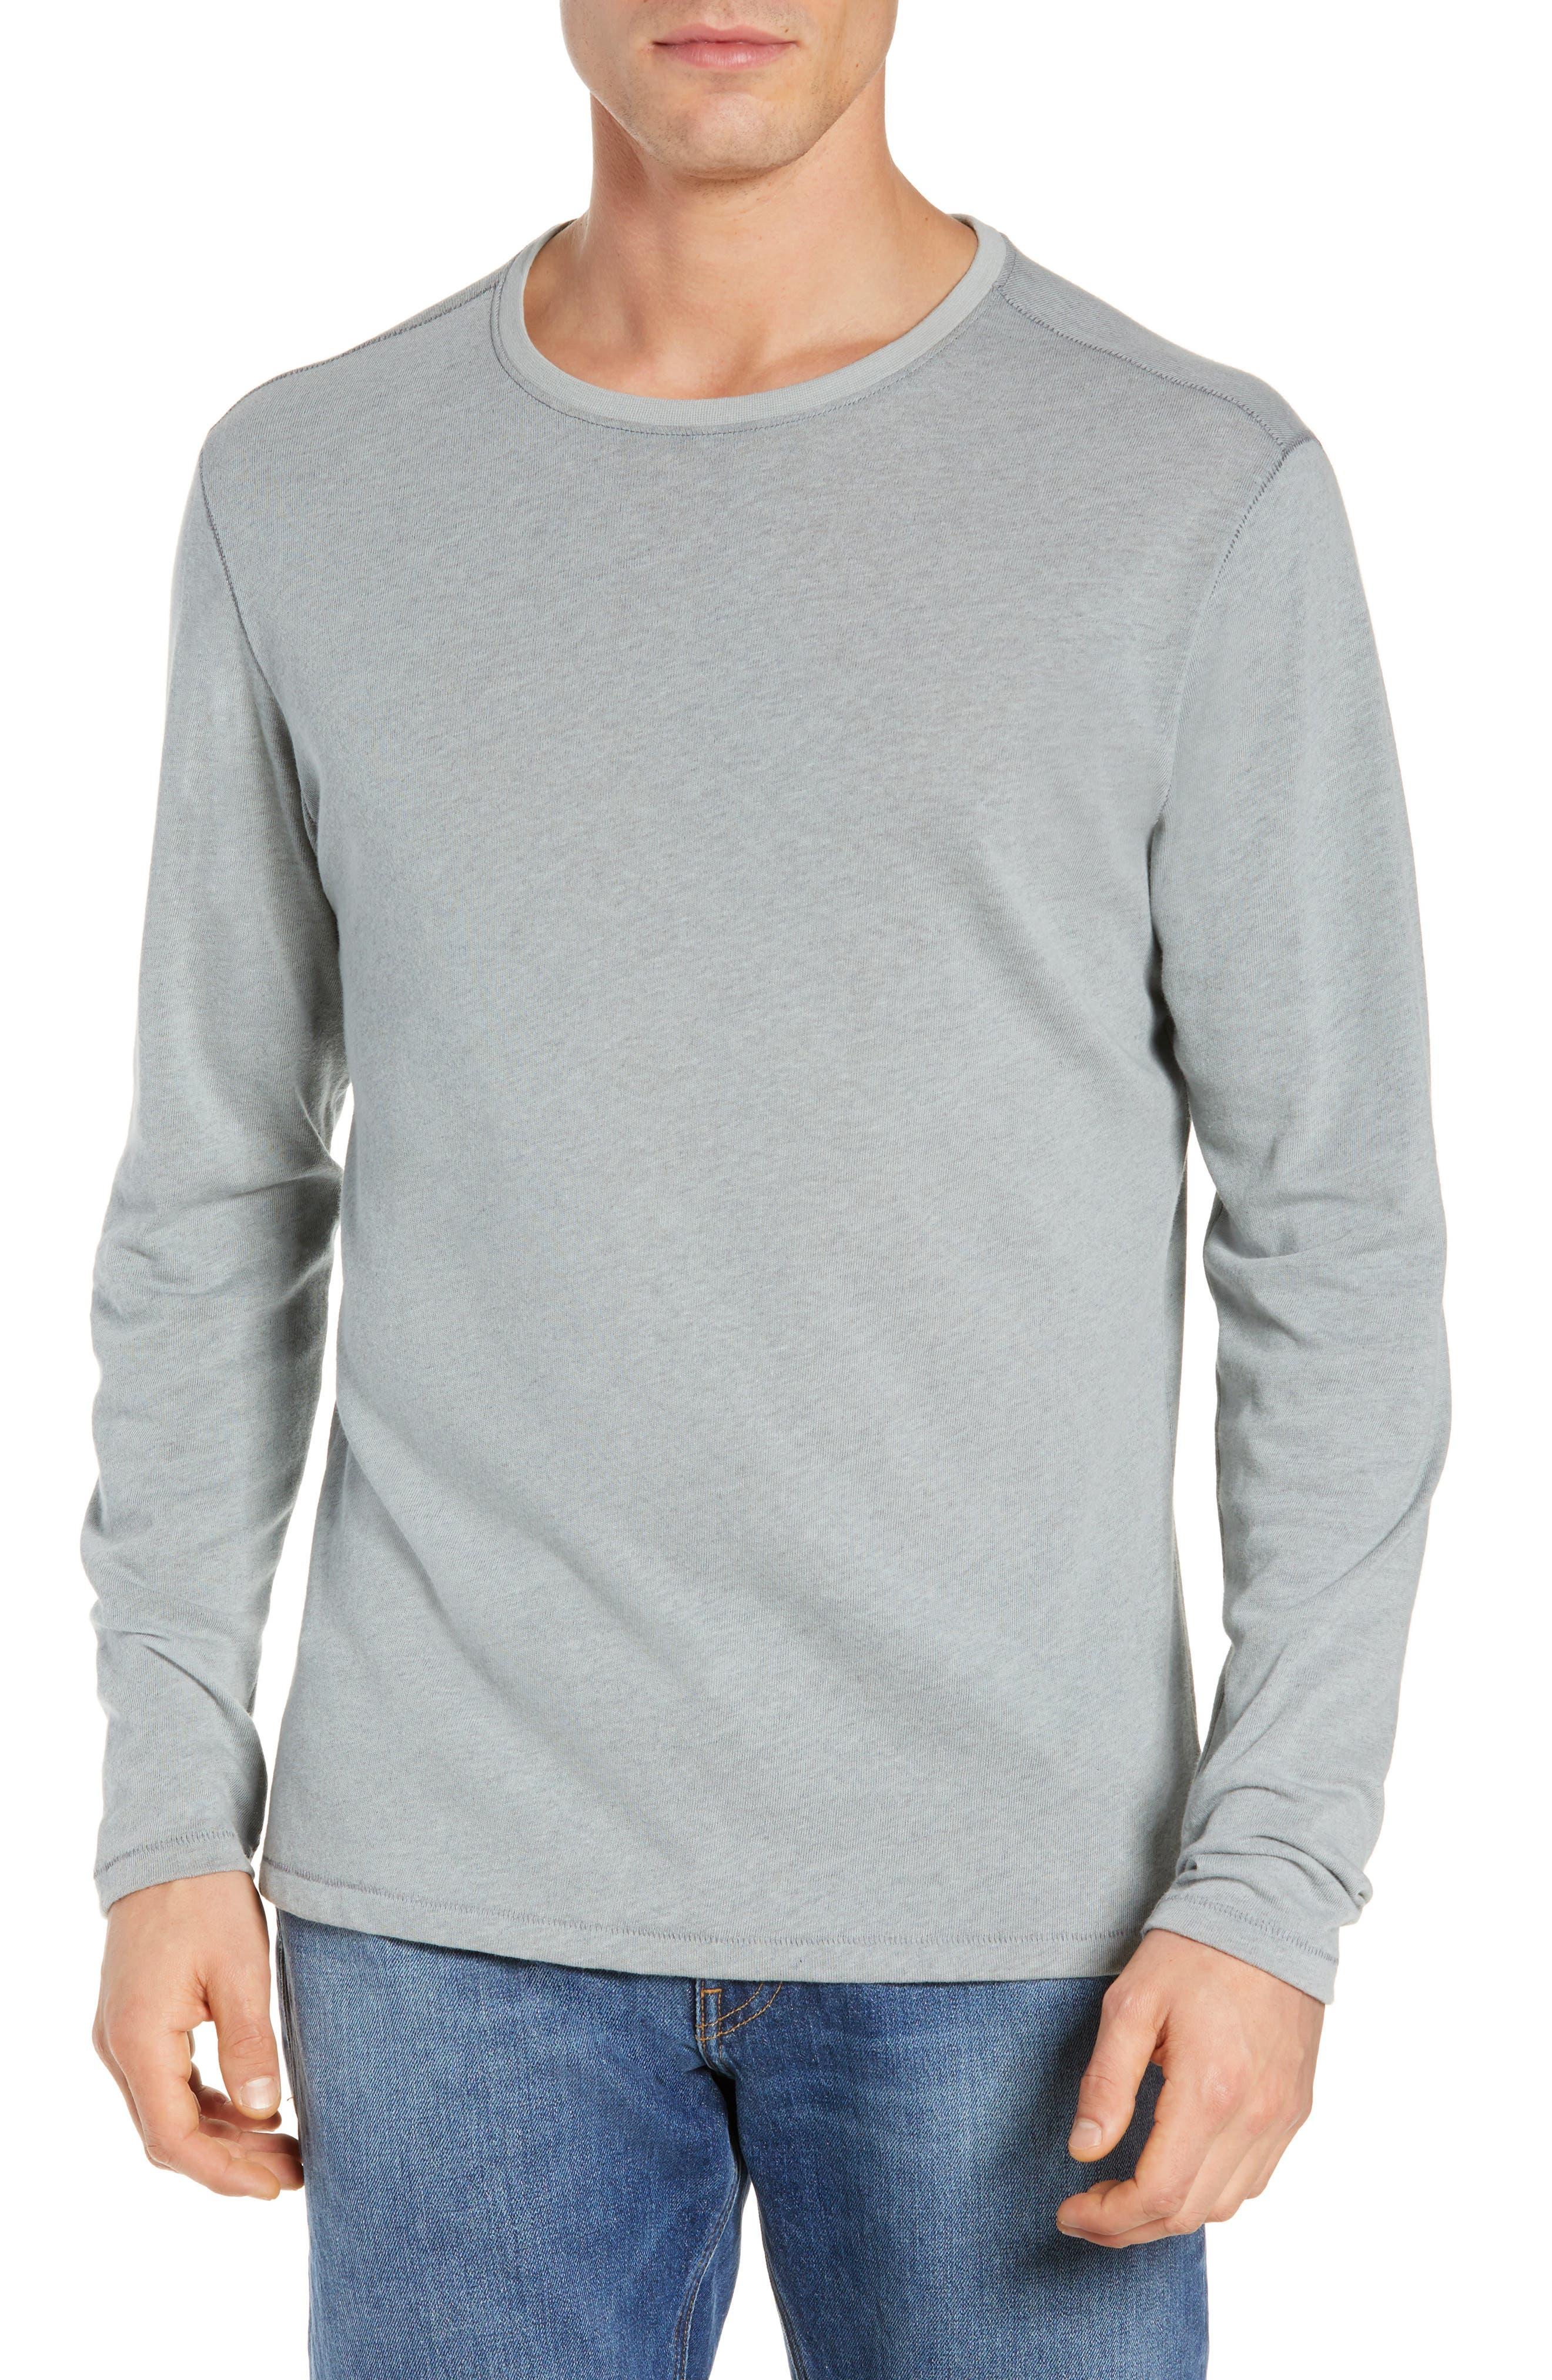 White Rock T-Shirt,                         Main,                         color, LIGHT GREY